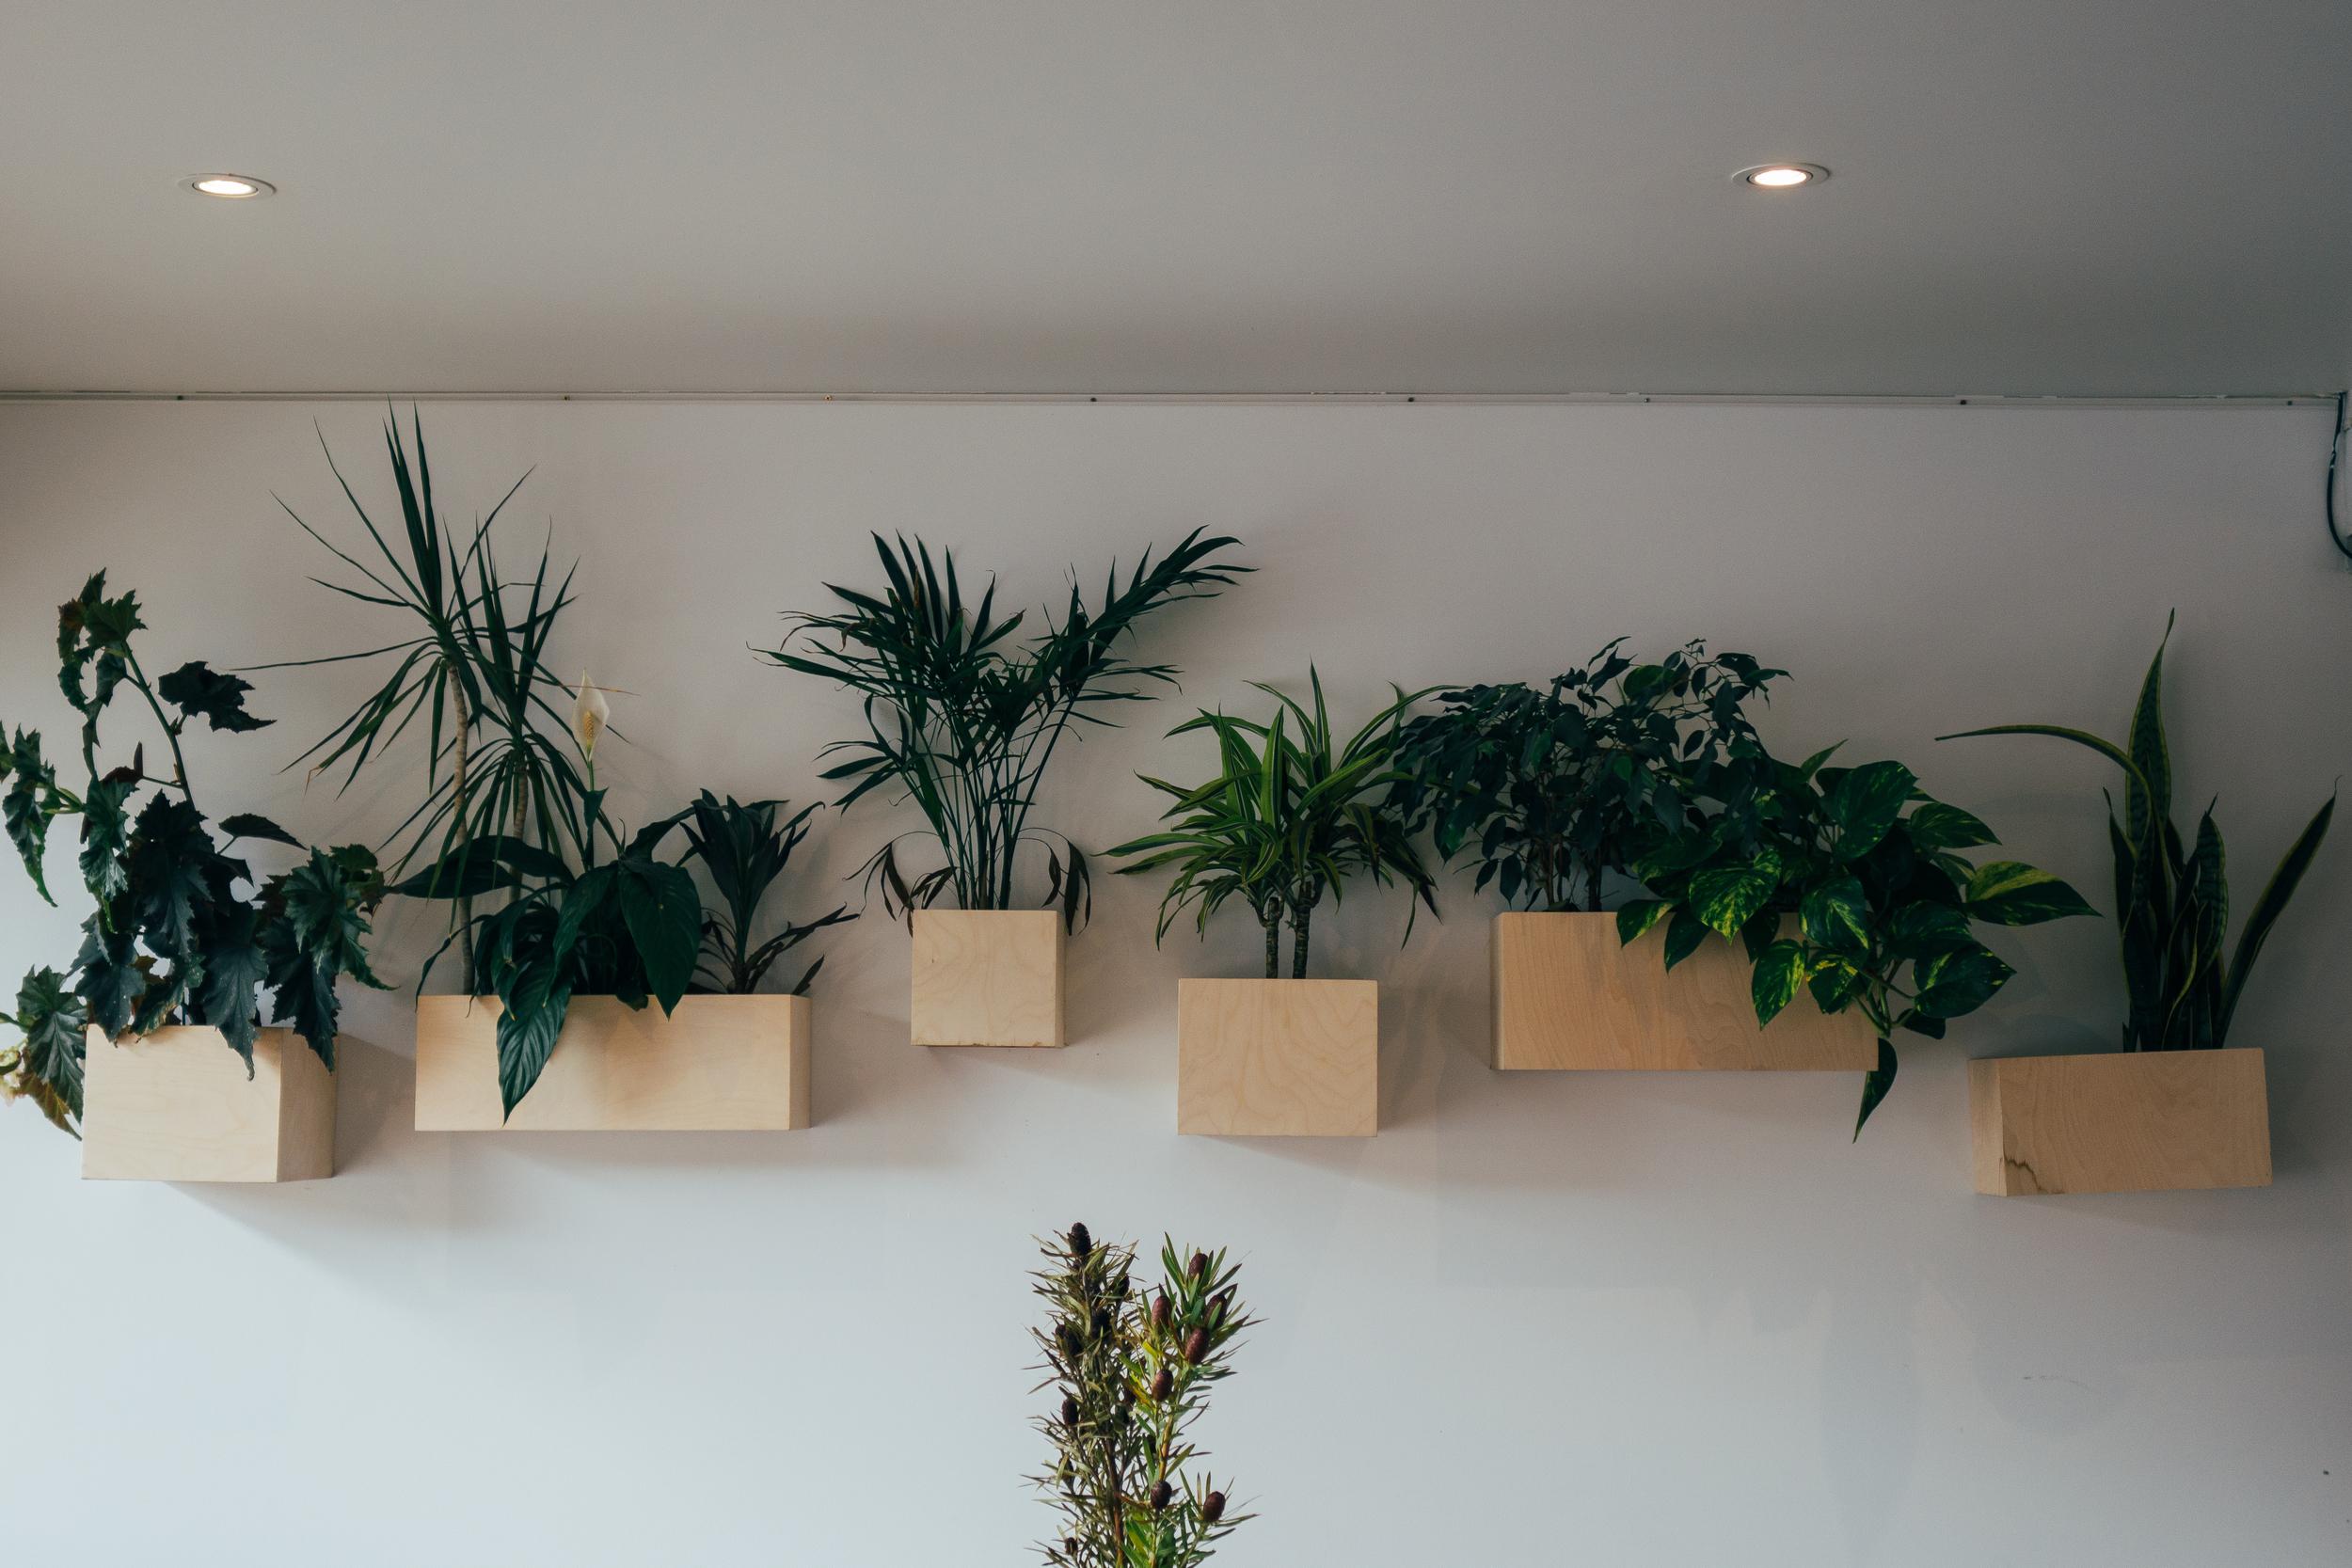 lucy lockett plants